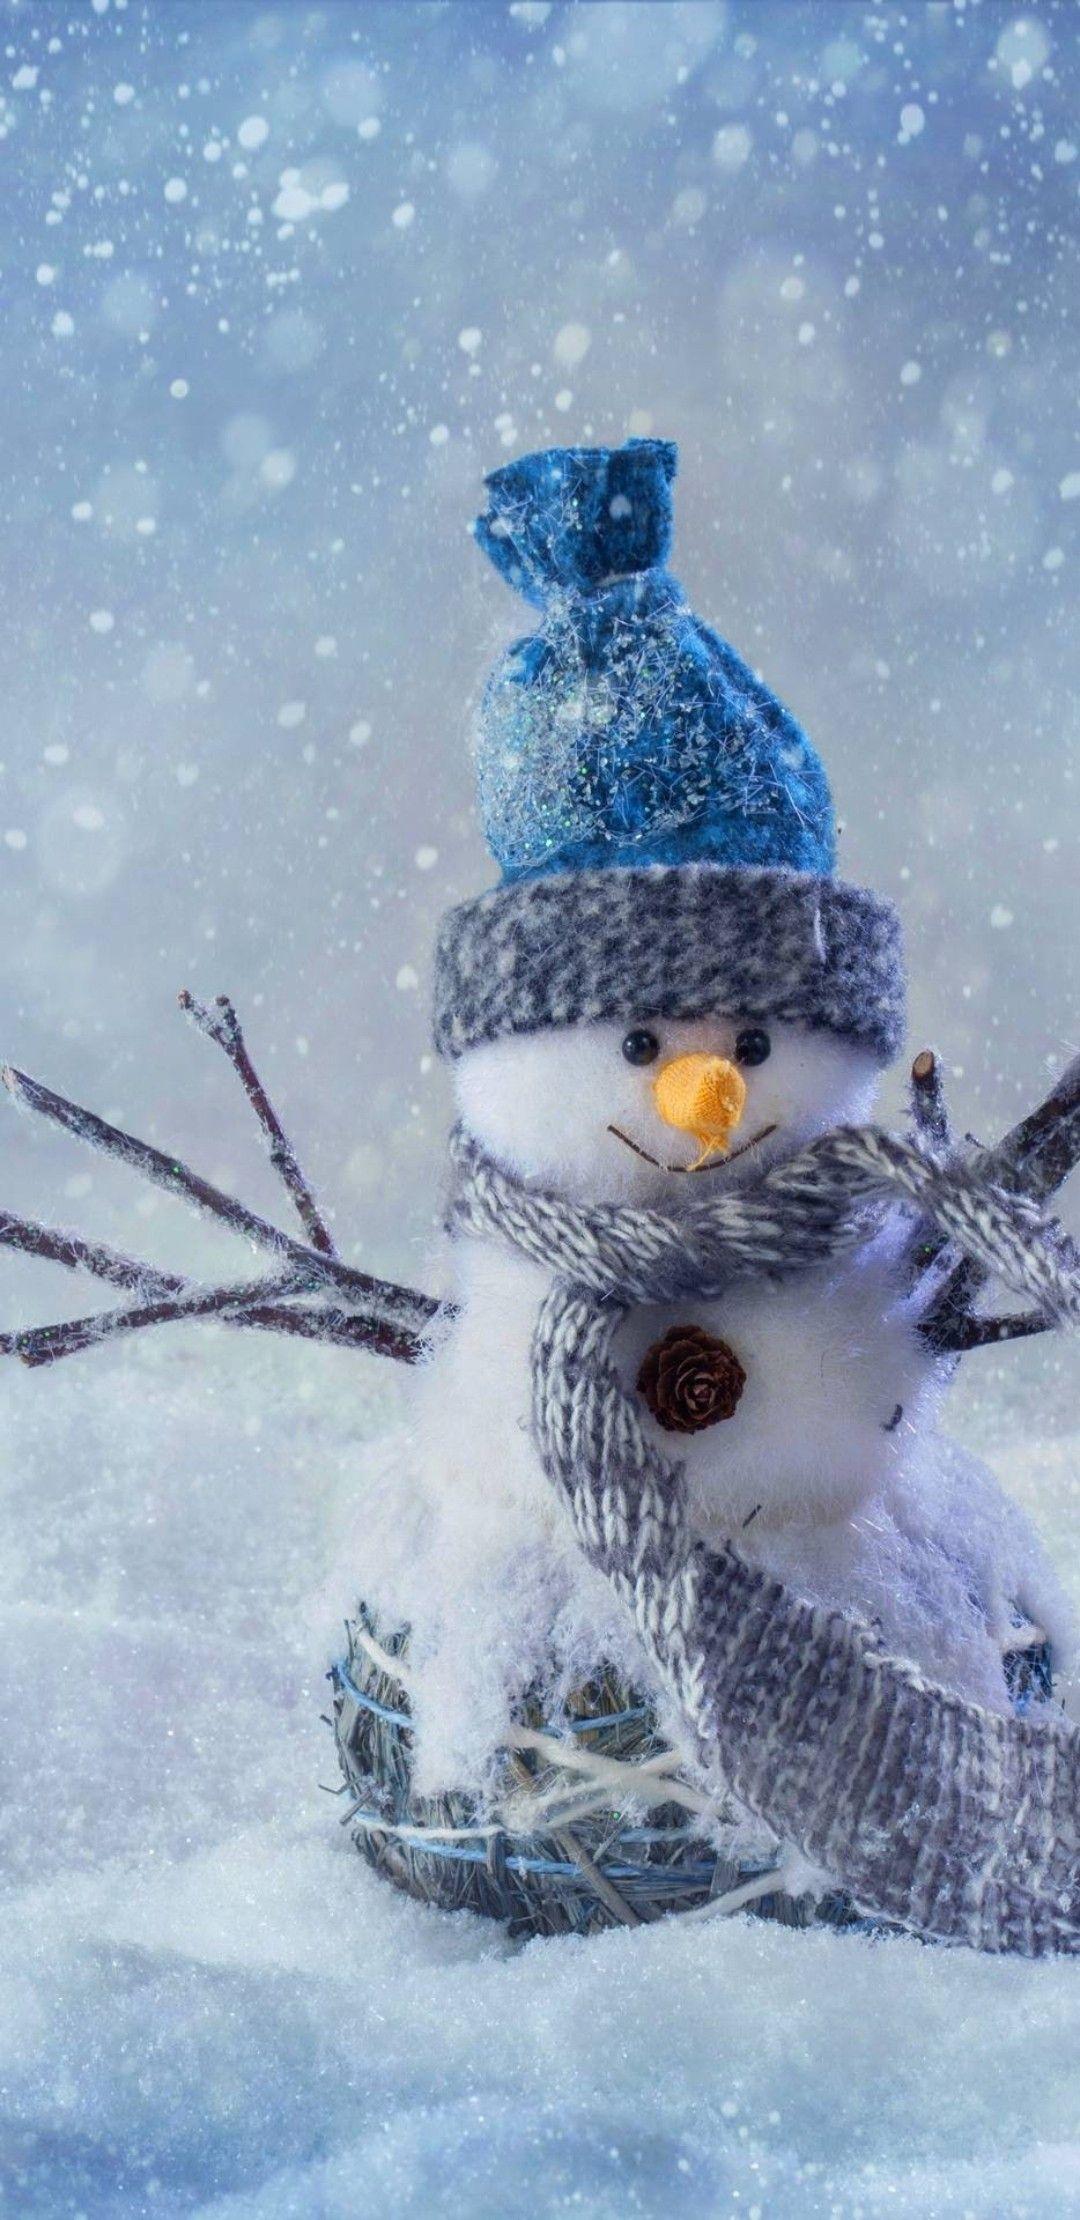 Pin by Samantha McMicking on Christmas Pinterest